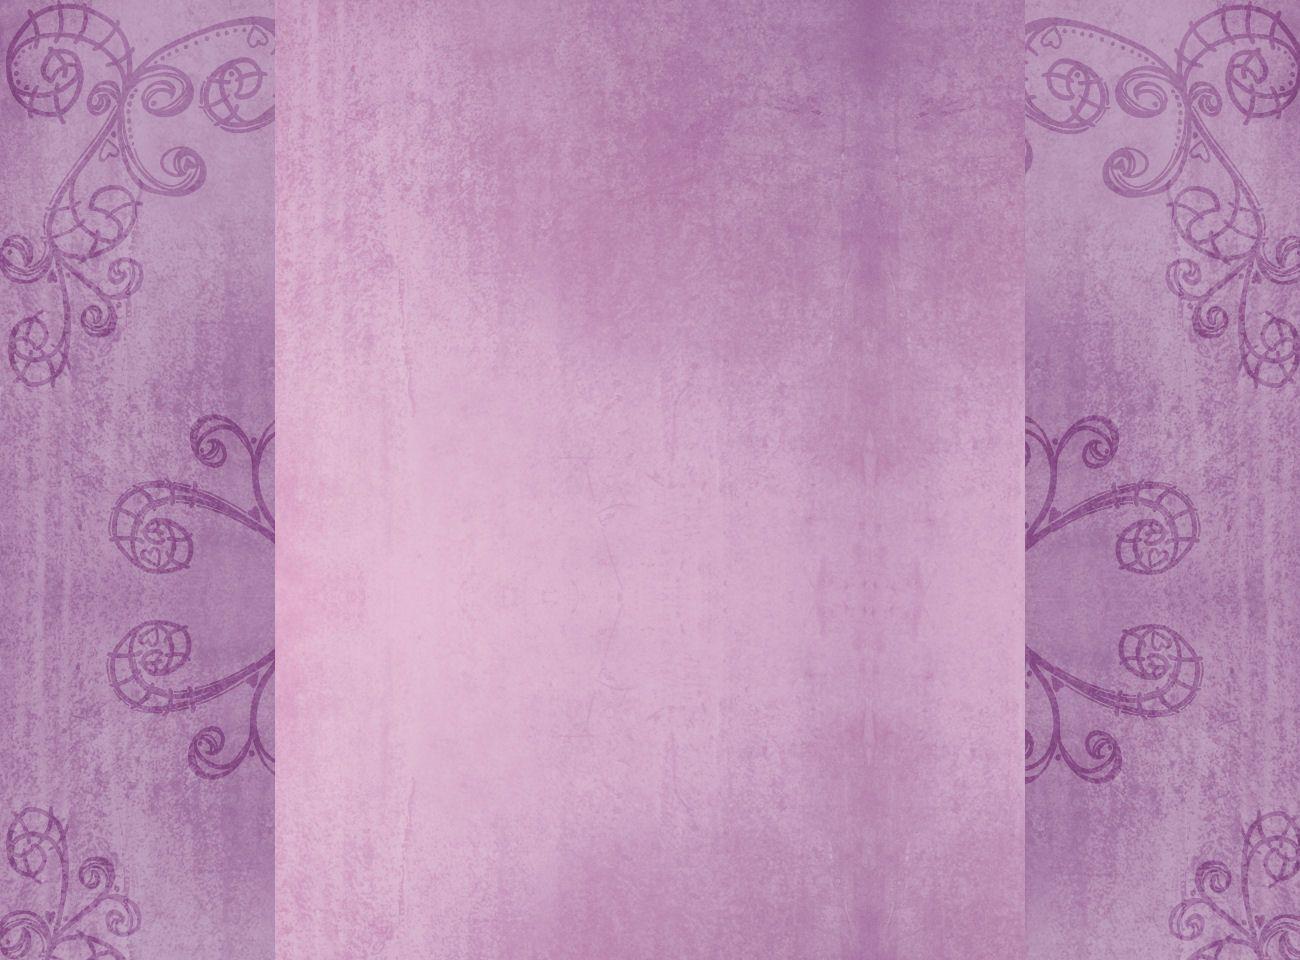 lavender background design - photo #19